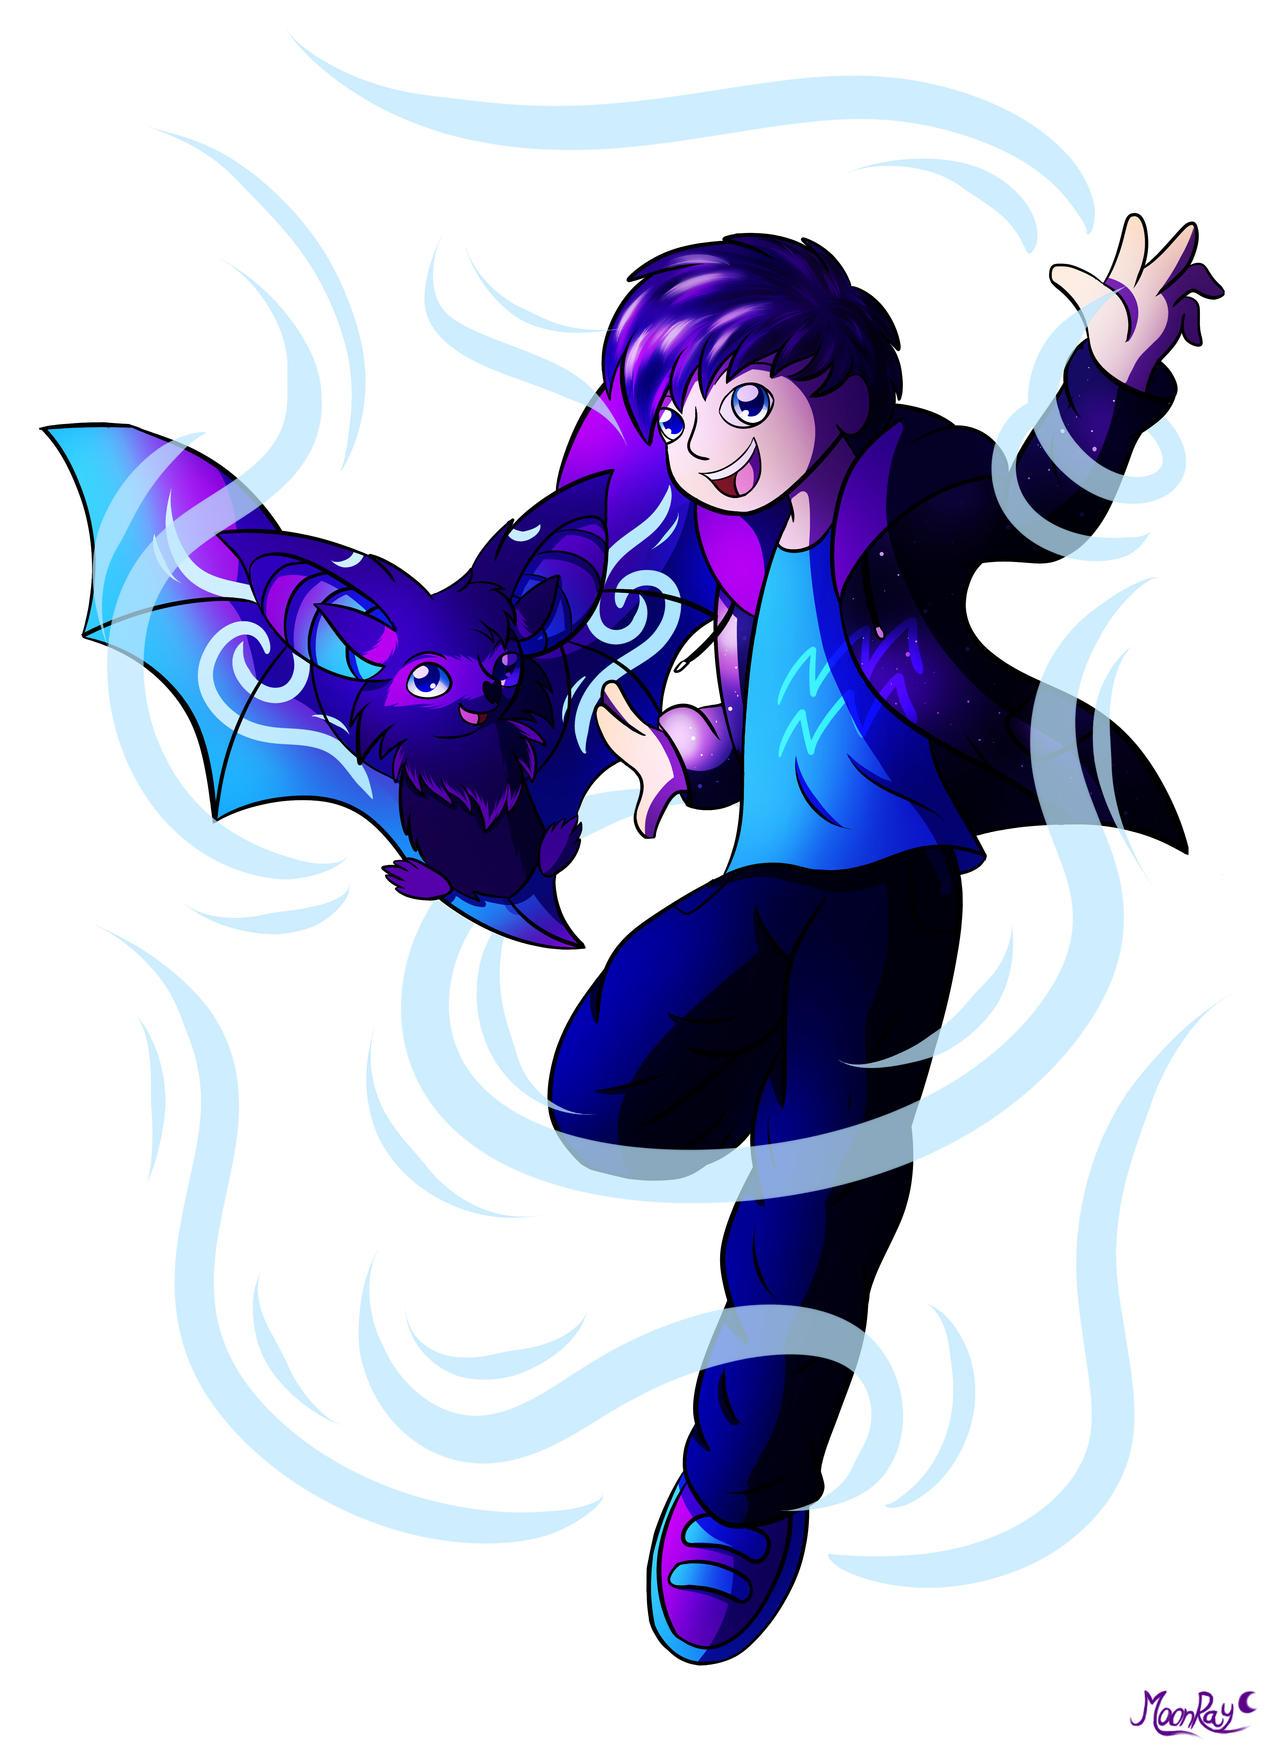 Aquarius by MoonRayCZ